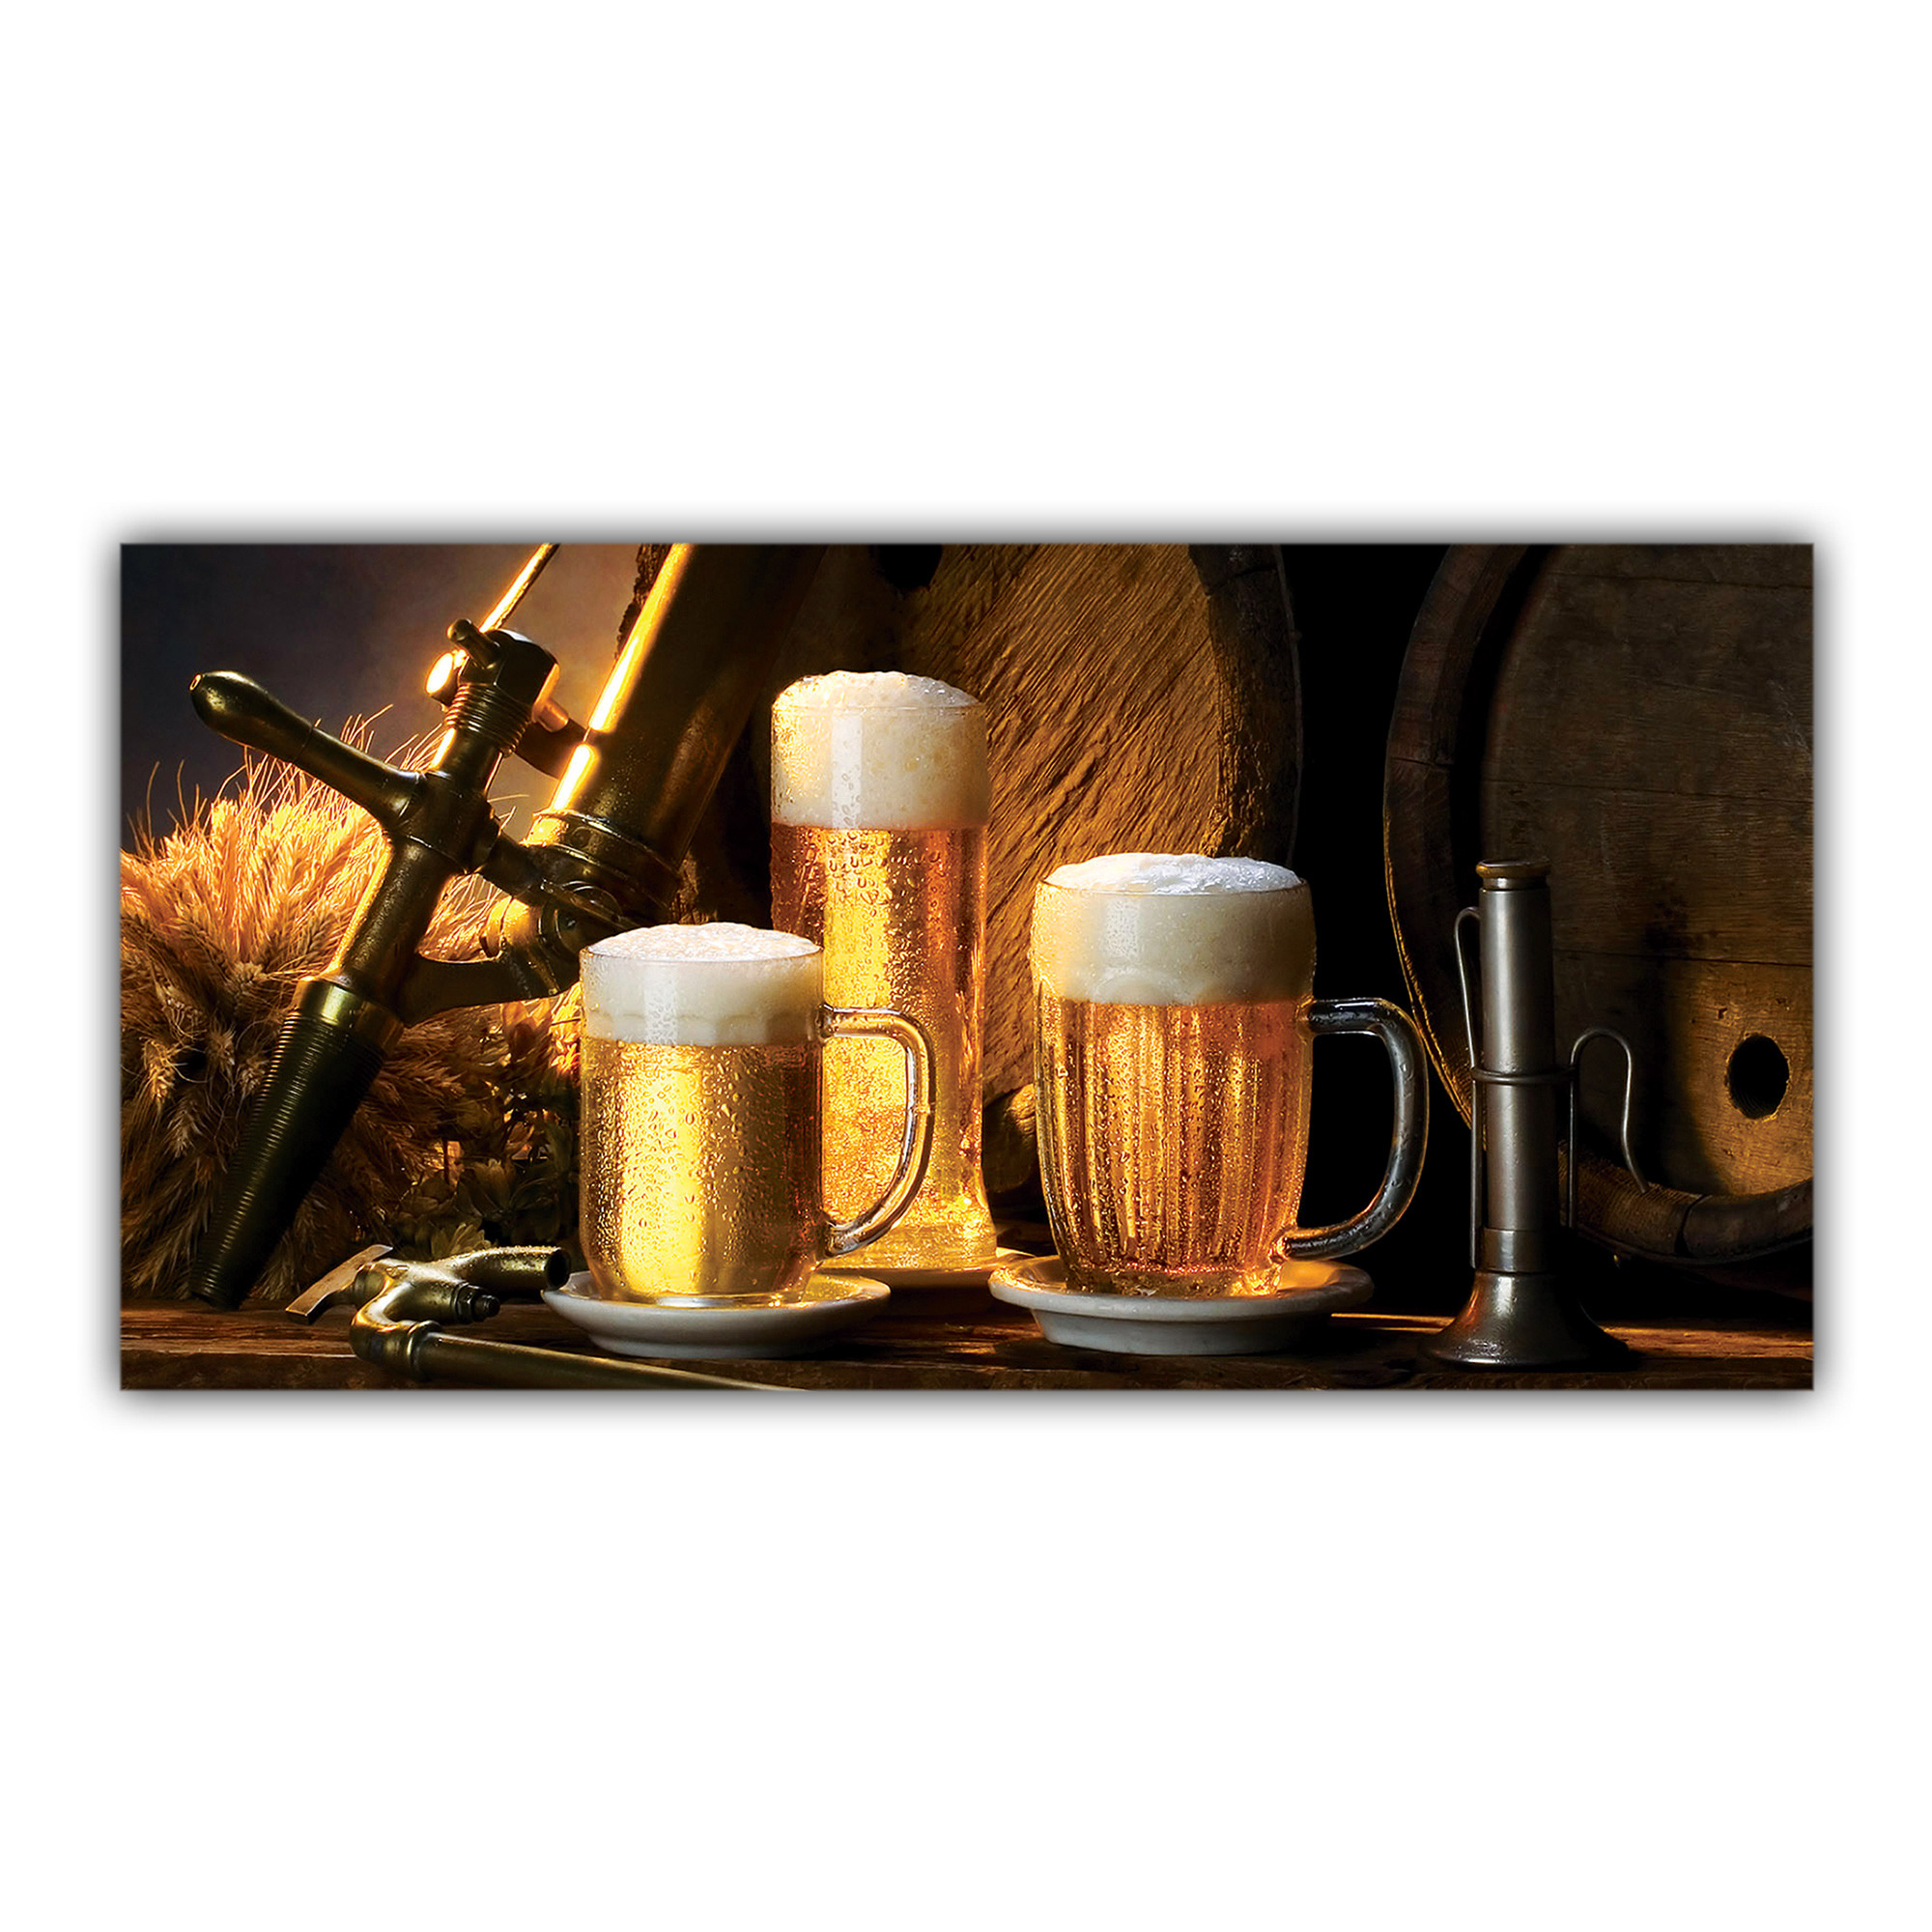 Bières Pression Brasserie